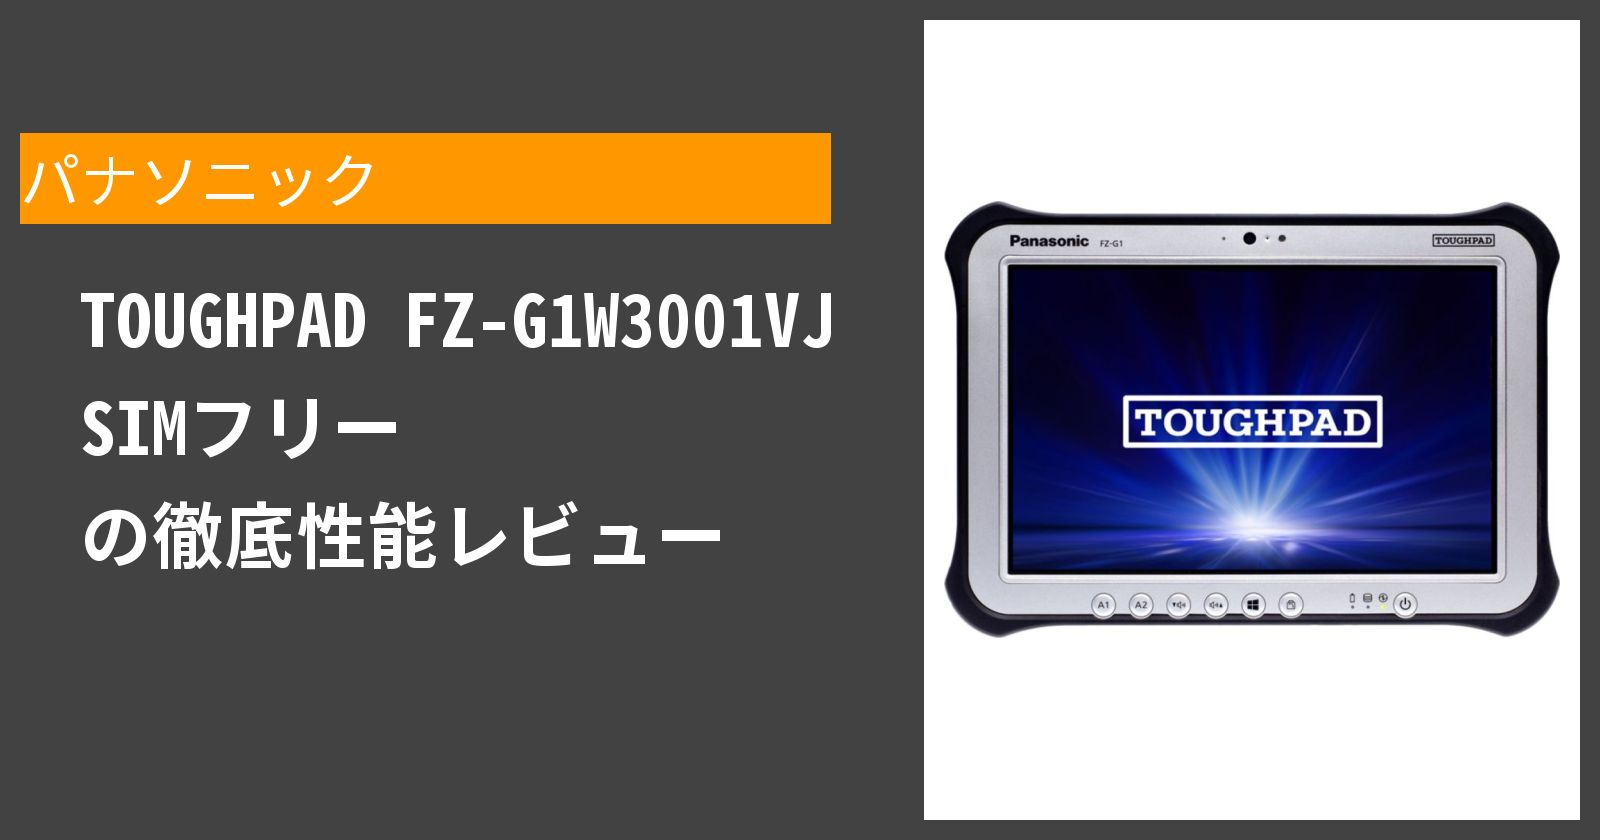 TOUGHPAD FZ-G1W3001VJ SIMフリー の徹底性能レビュー